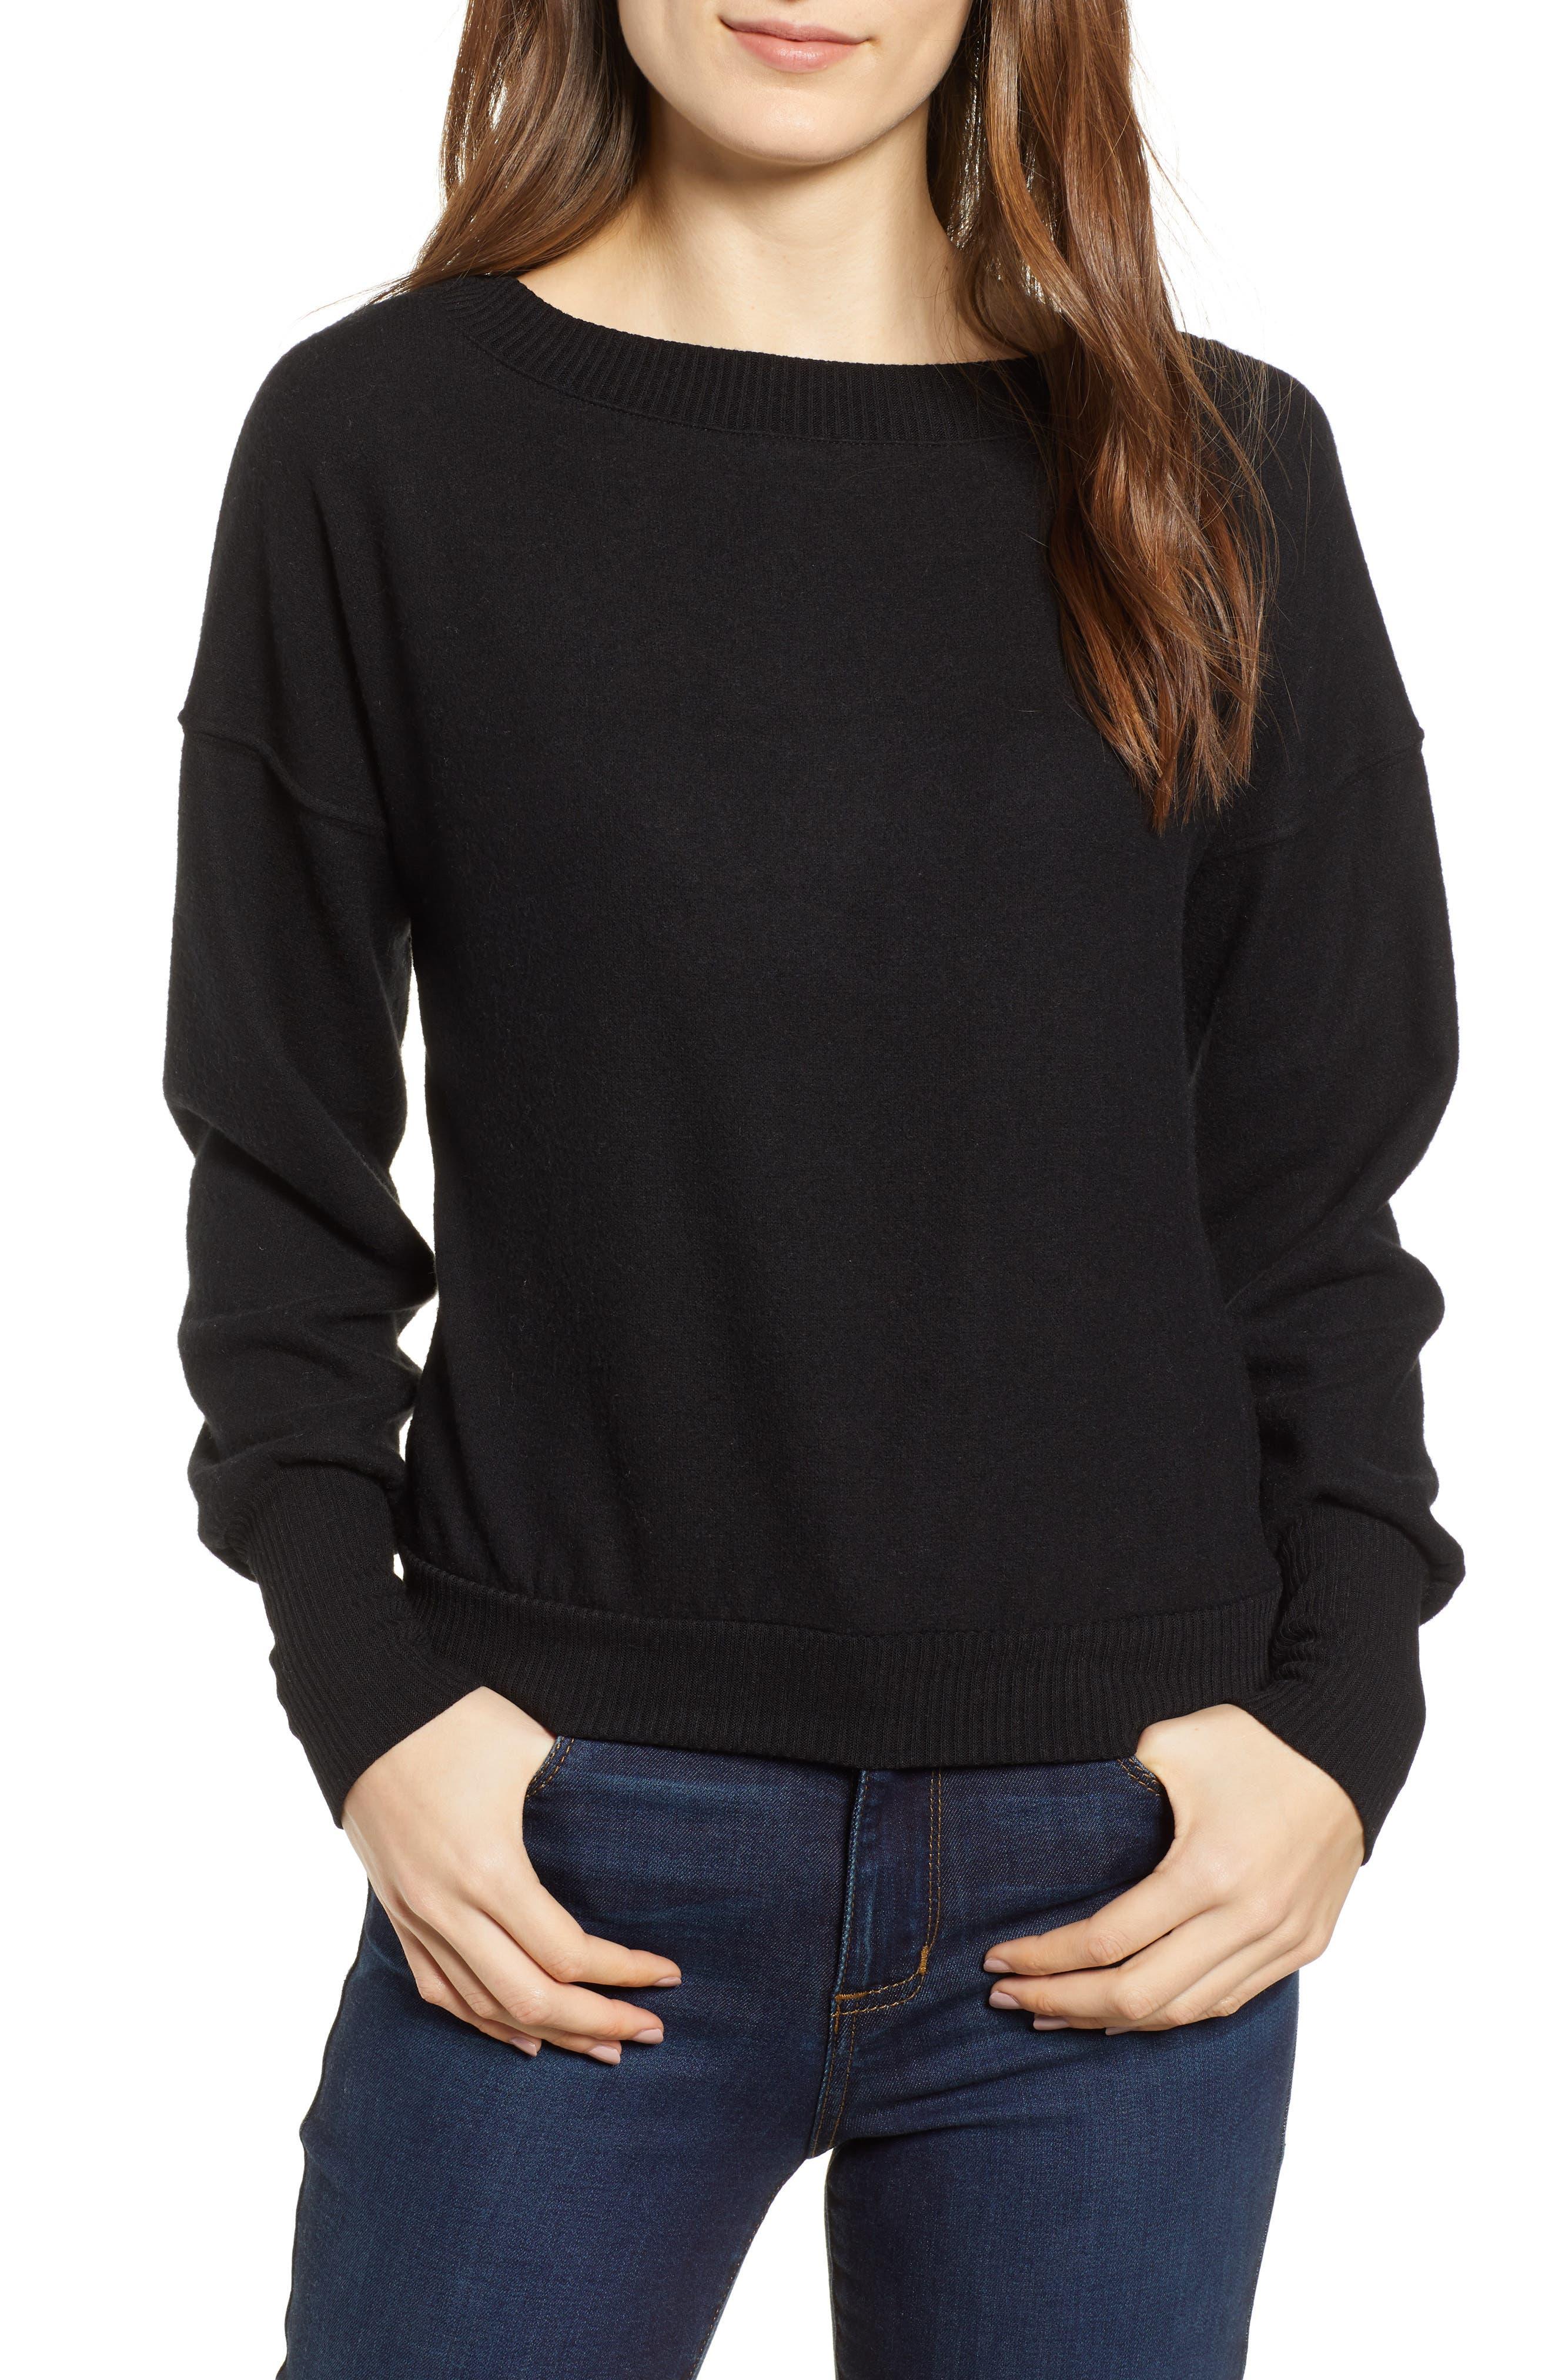 Darwin Cozy Sweatshirt,                             Main thumbnail 1, color,                             BLACK